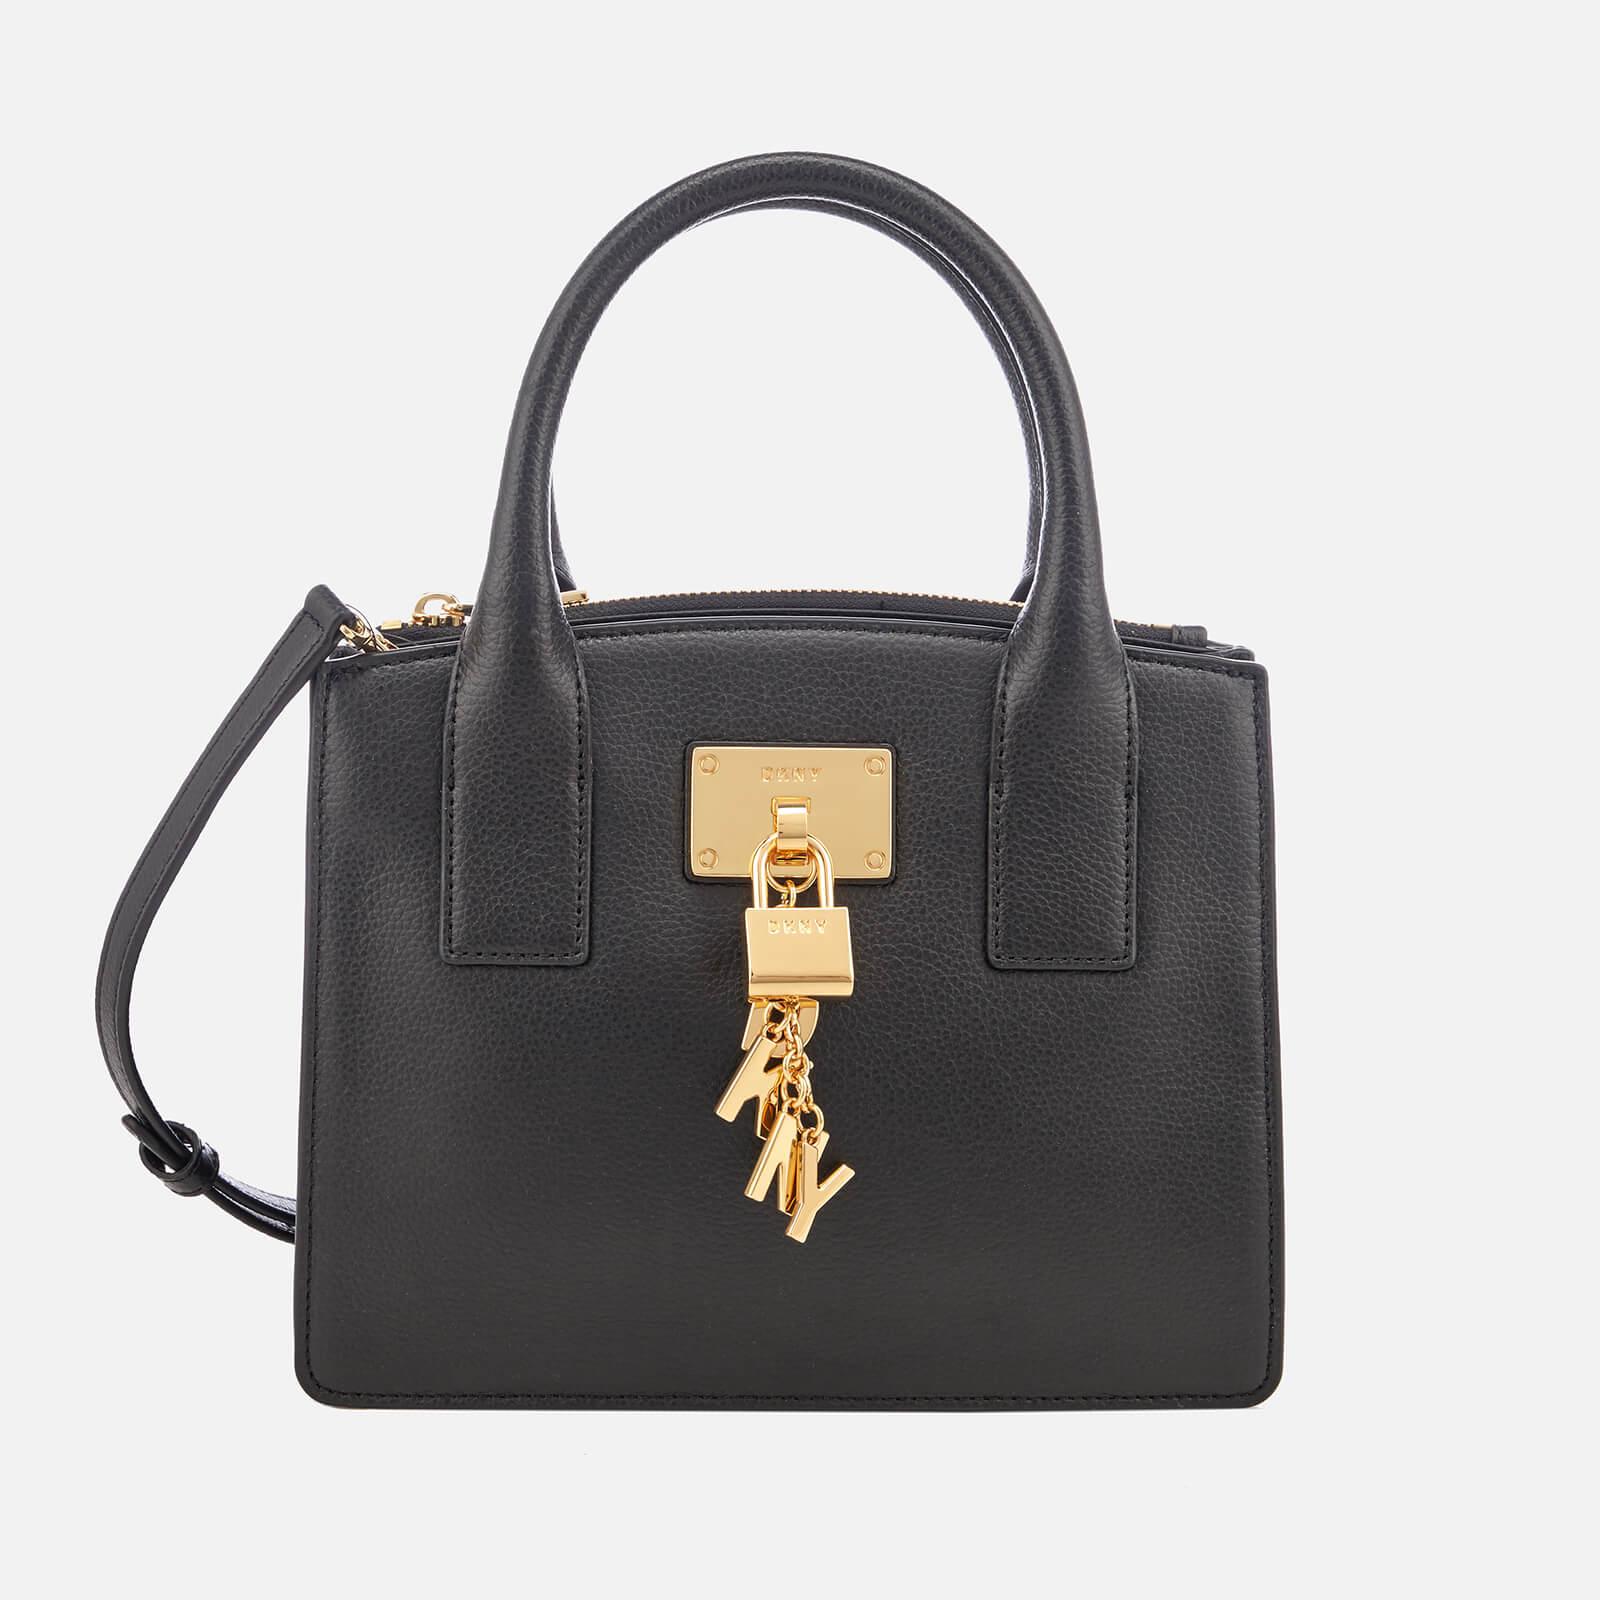 33879b3222f DKNY Women's Elissa Small Tote Bag - Black/Gold